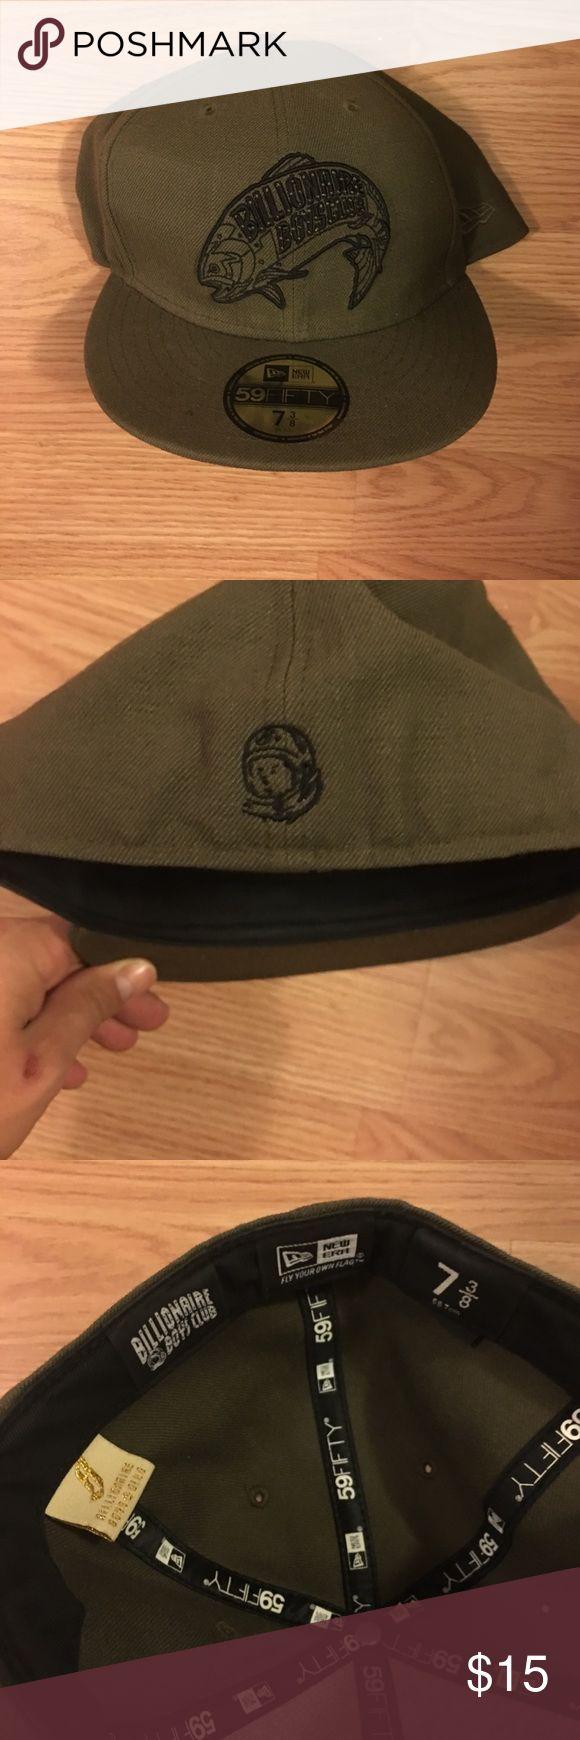 Billionaire Boys Club Hat 7 3/8 Fresh BBC cap Billionaire Boys Club Accessories Hats